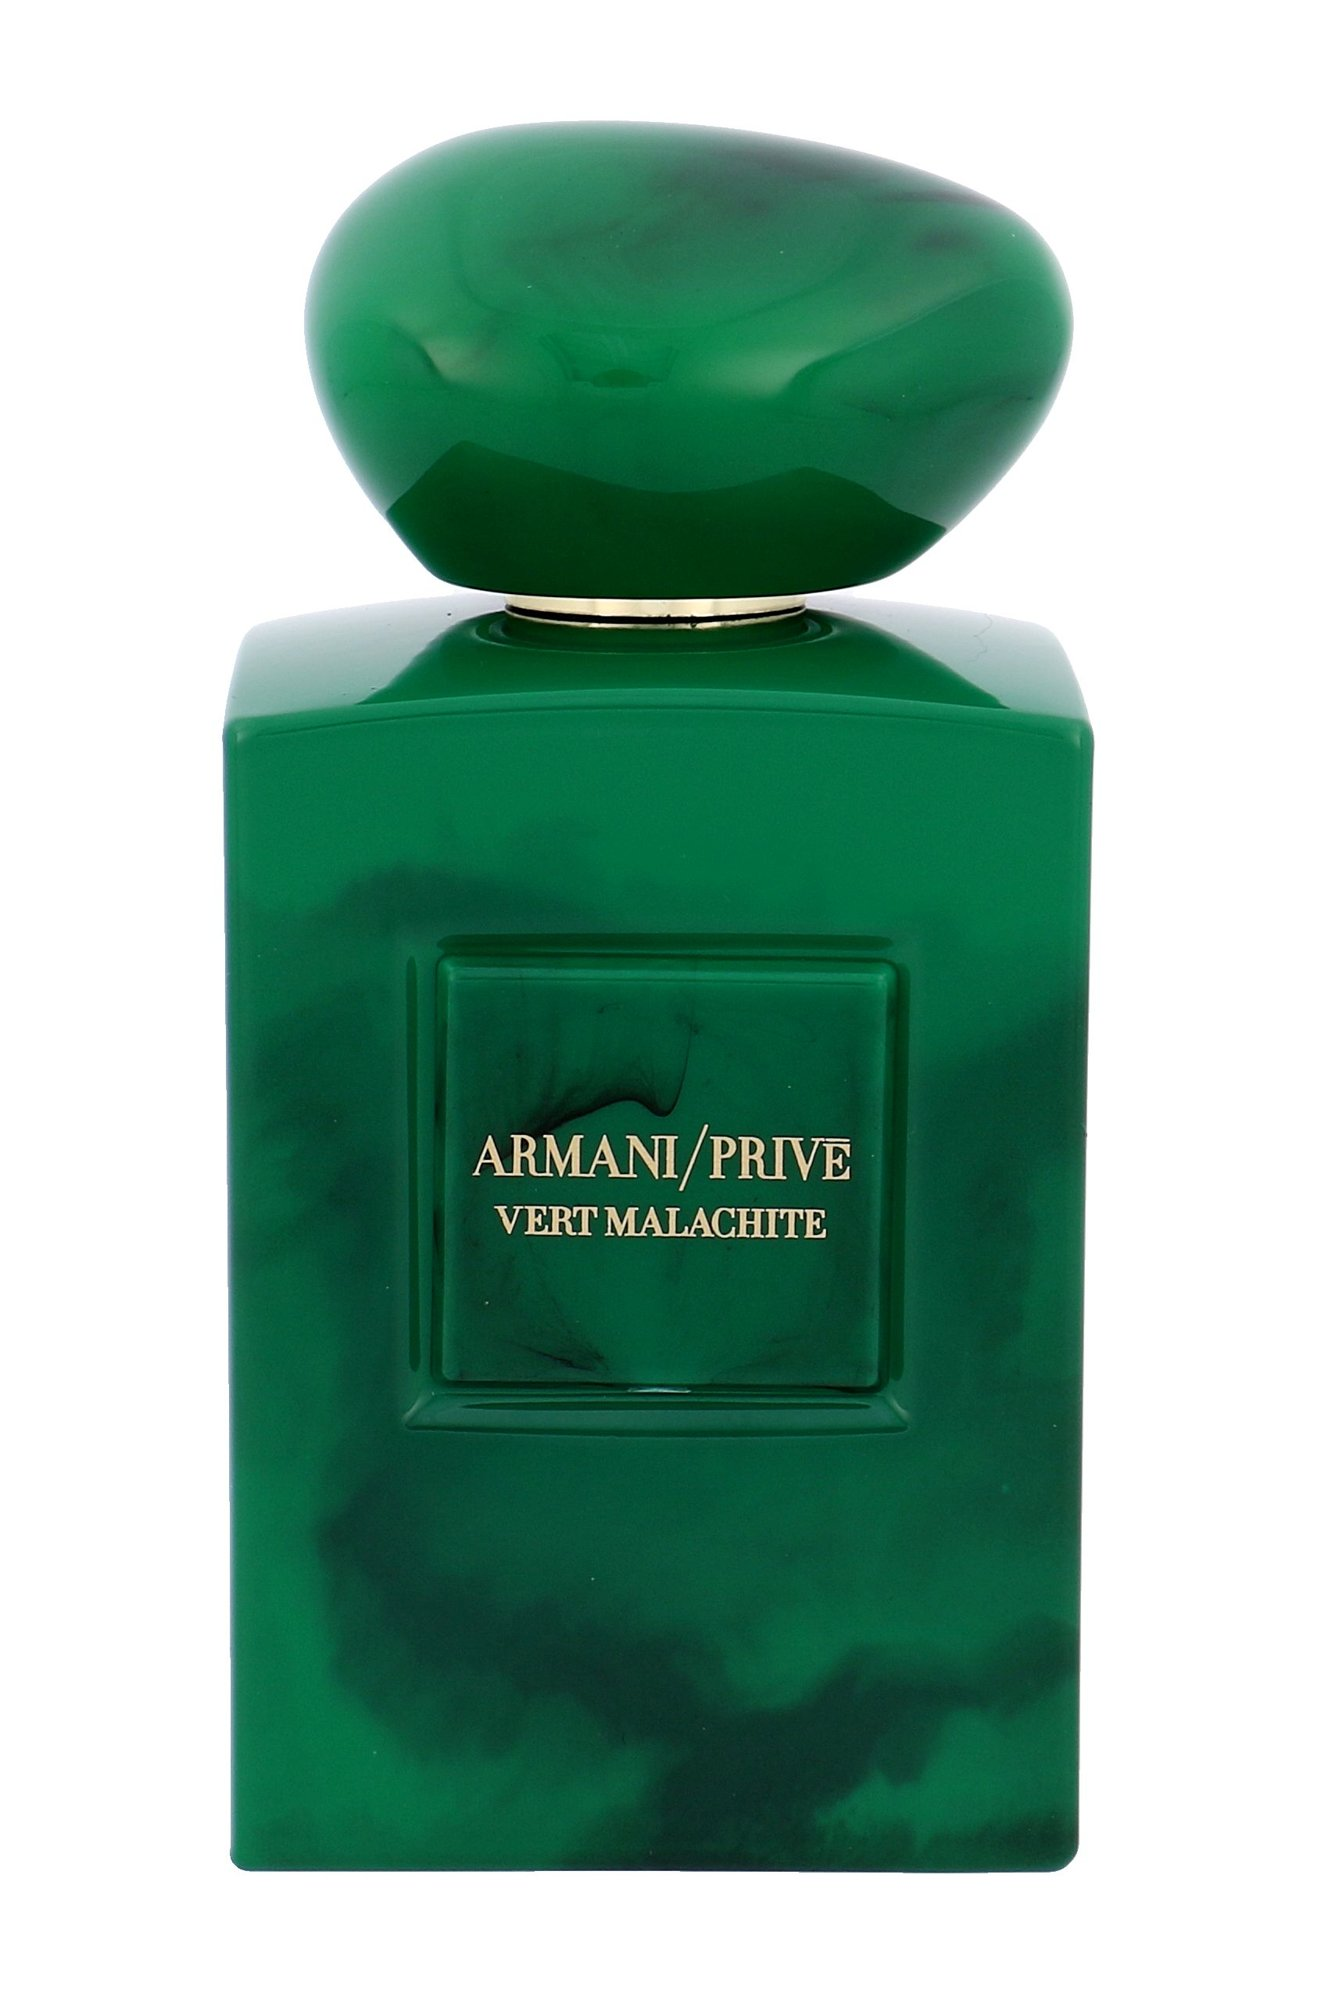 Armani Privé Vert Malachite EDP 100ml